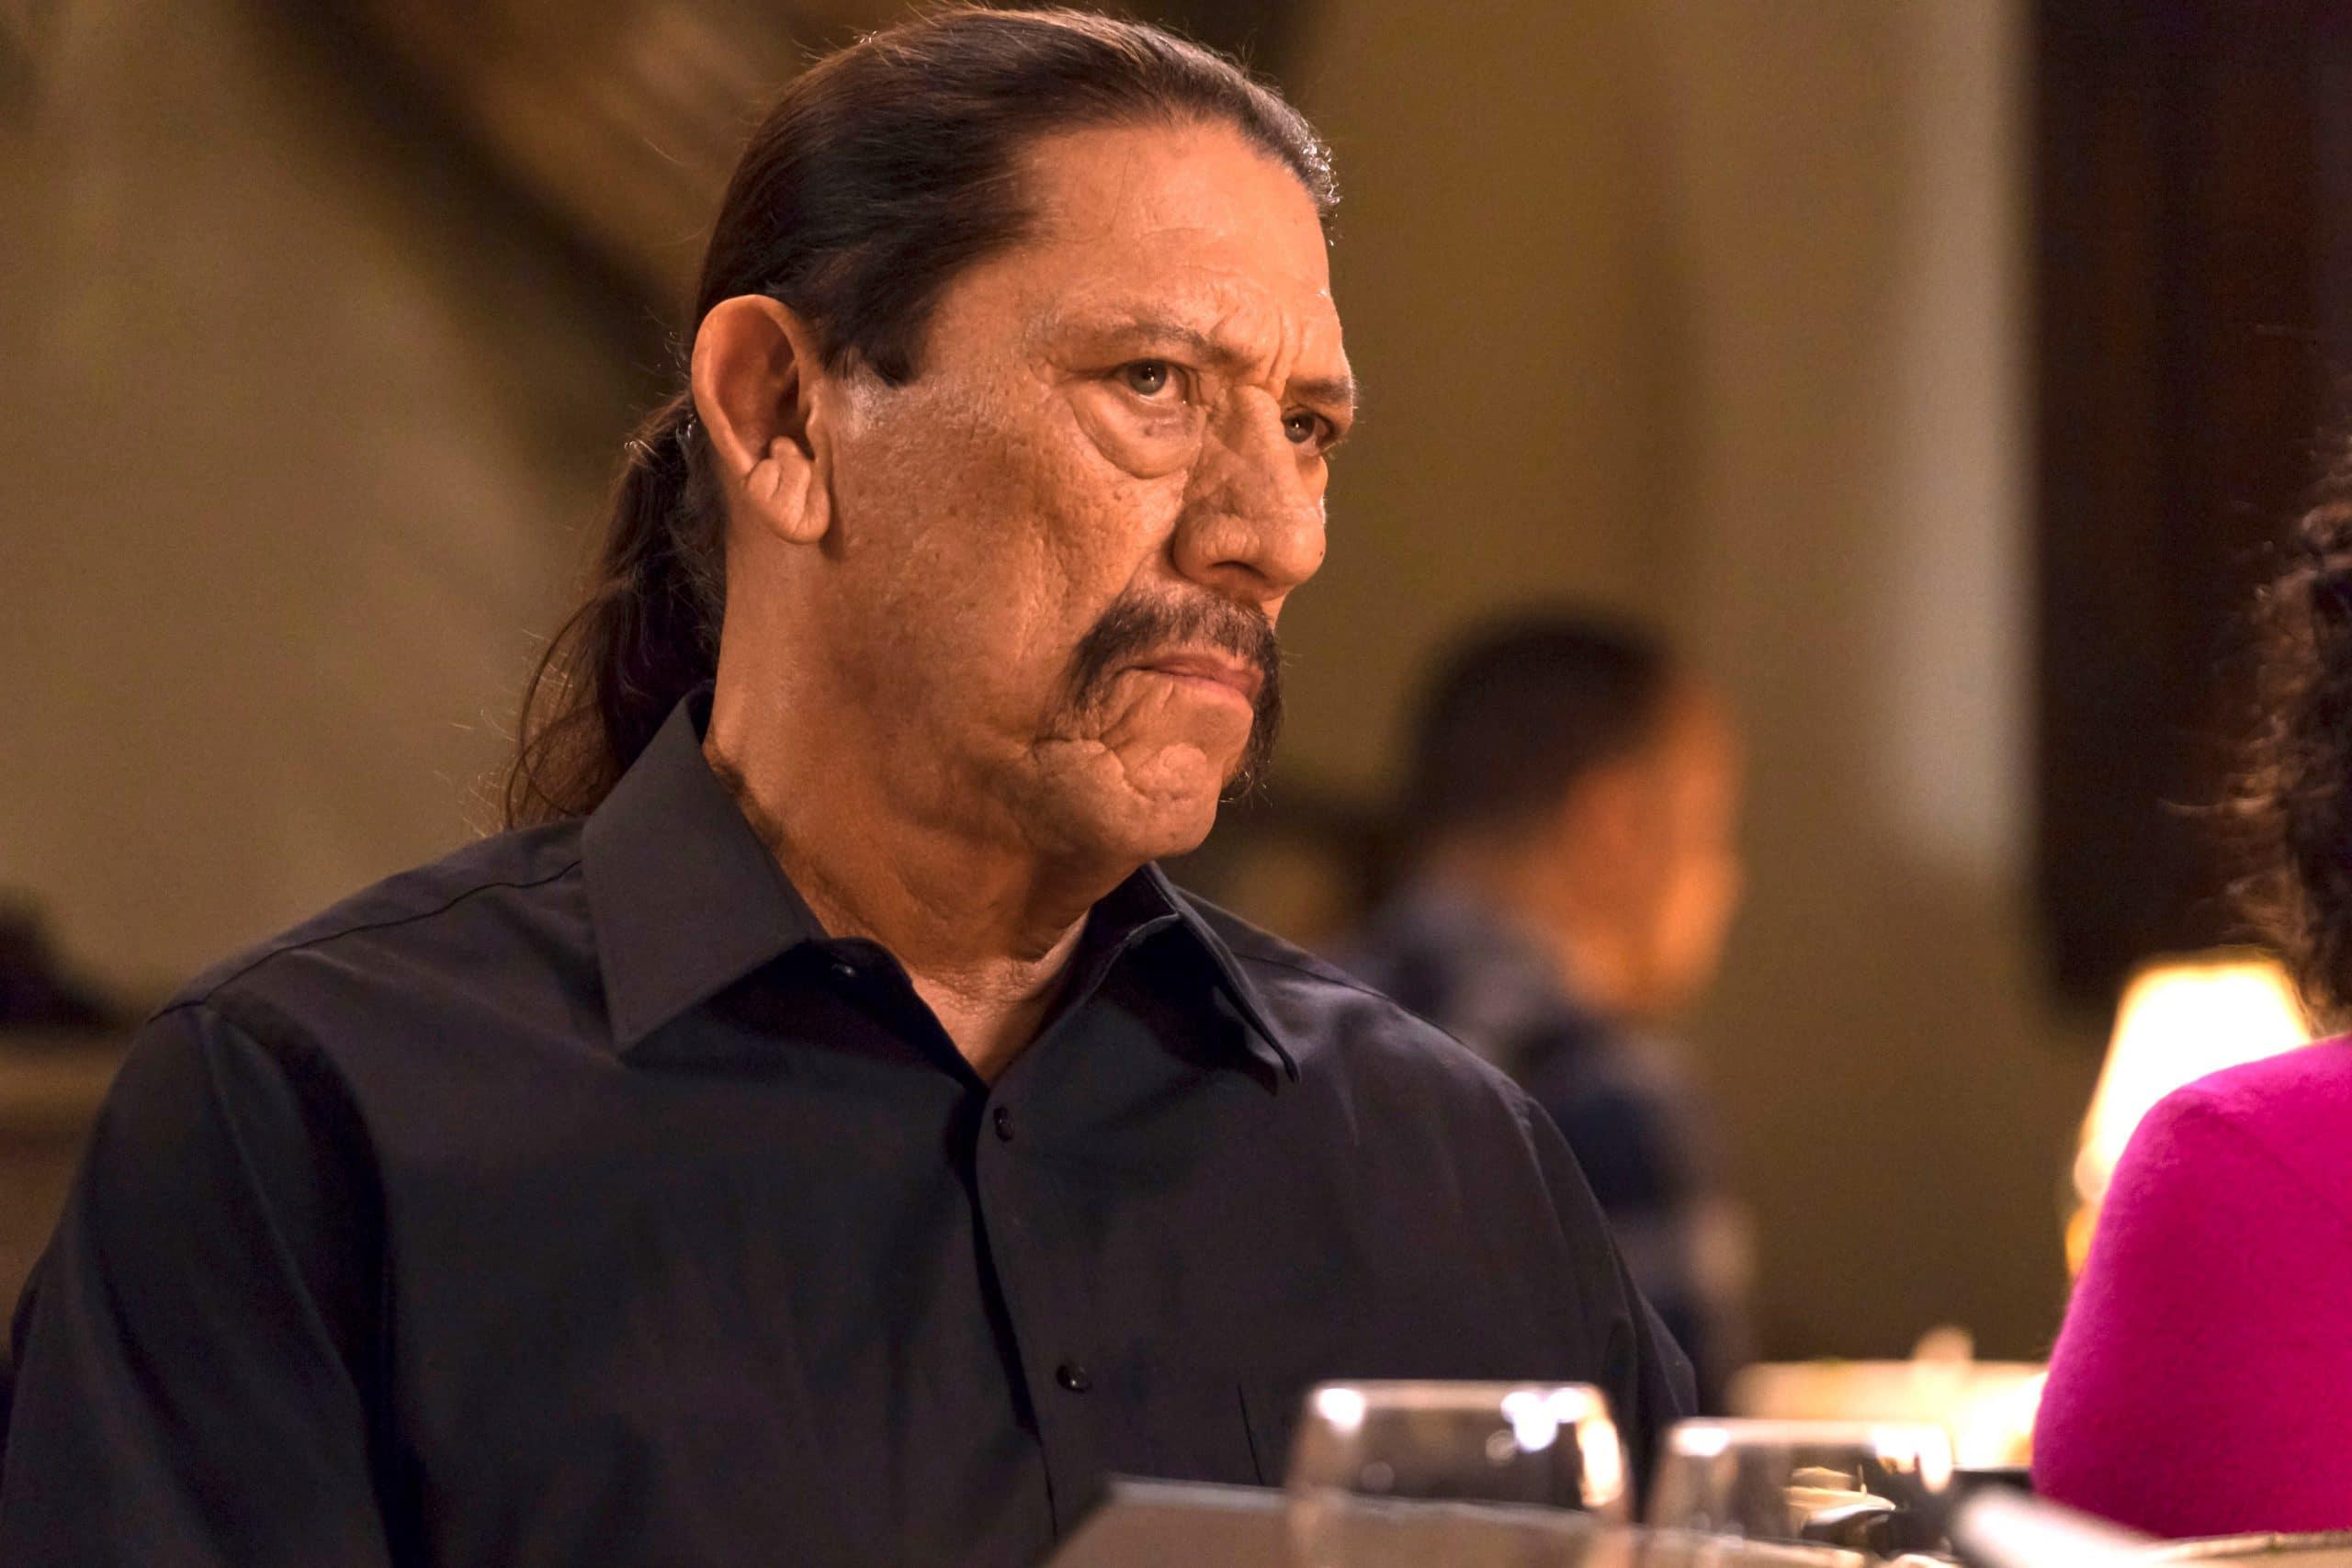 BROOKLYN NINE-NINE, Danny Trejo in 'Game Night - Godfather', (Season 5, Episode 510, aired December 12, 2017)